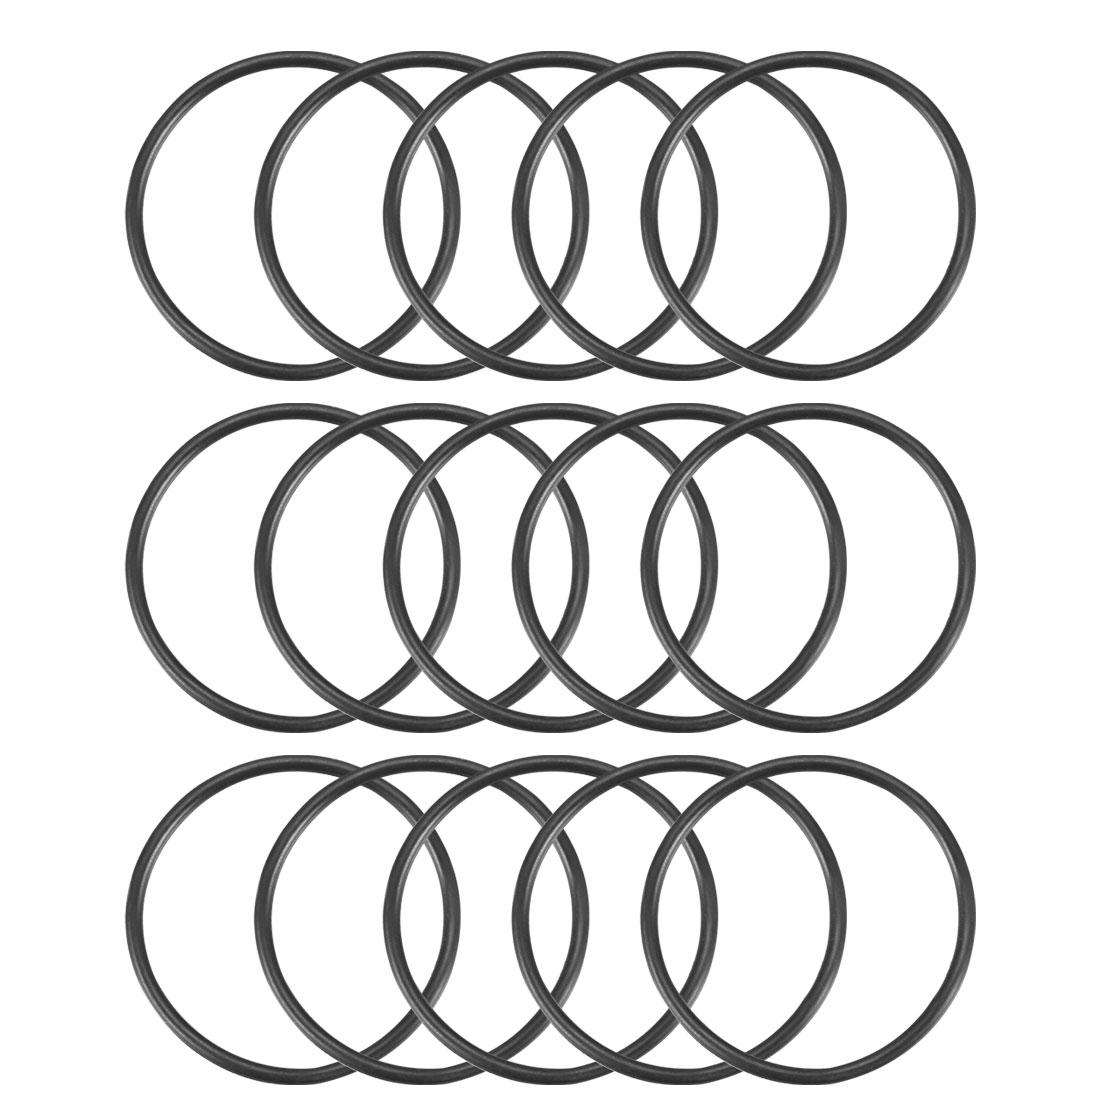 15Pcs Black 37 x 2mm Industrial Flexible Rubber O Ring Oil Sealing Grommets